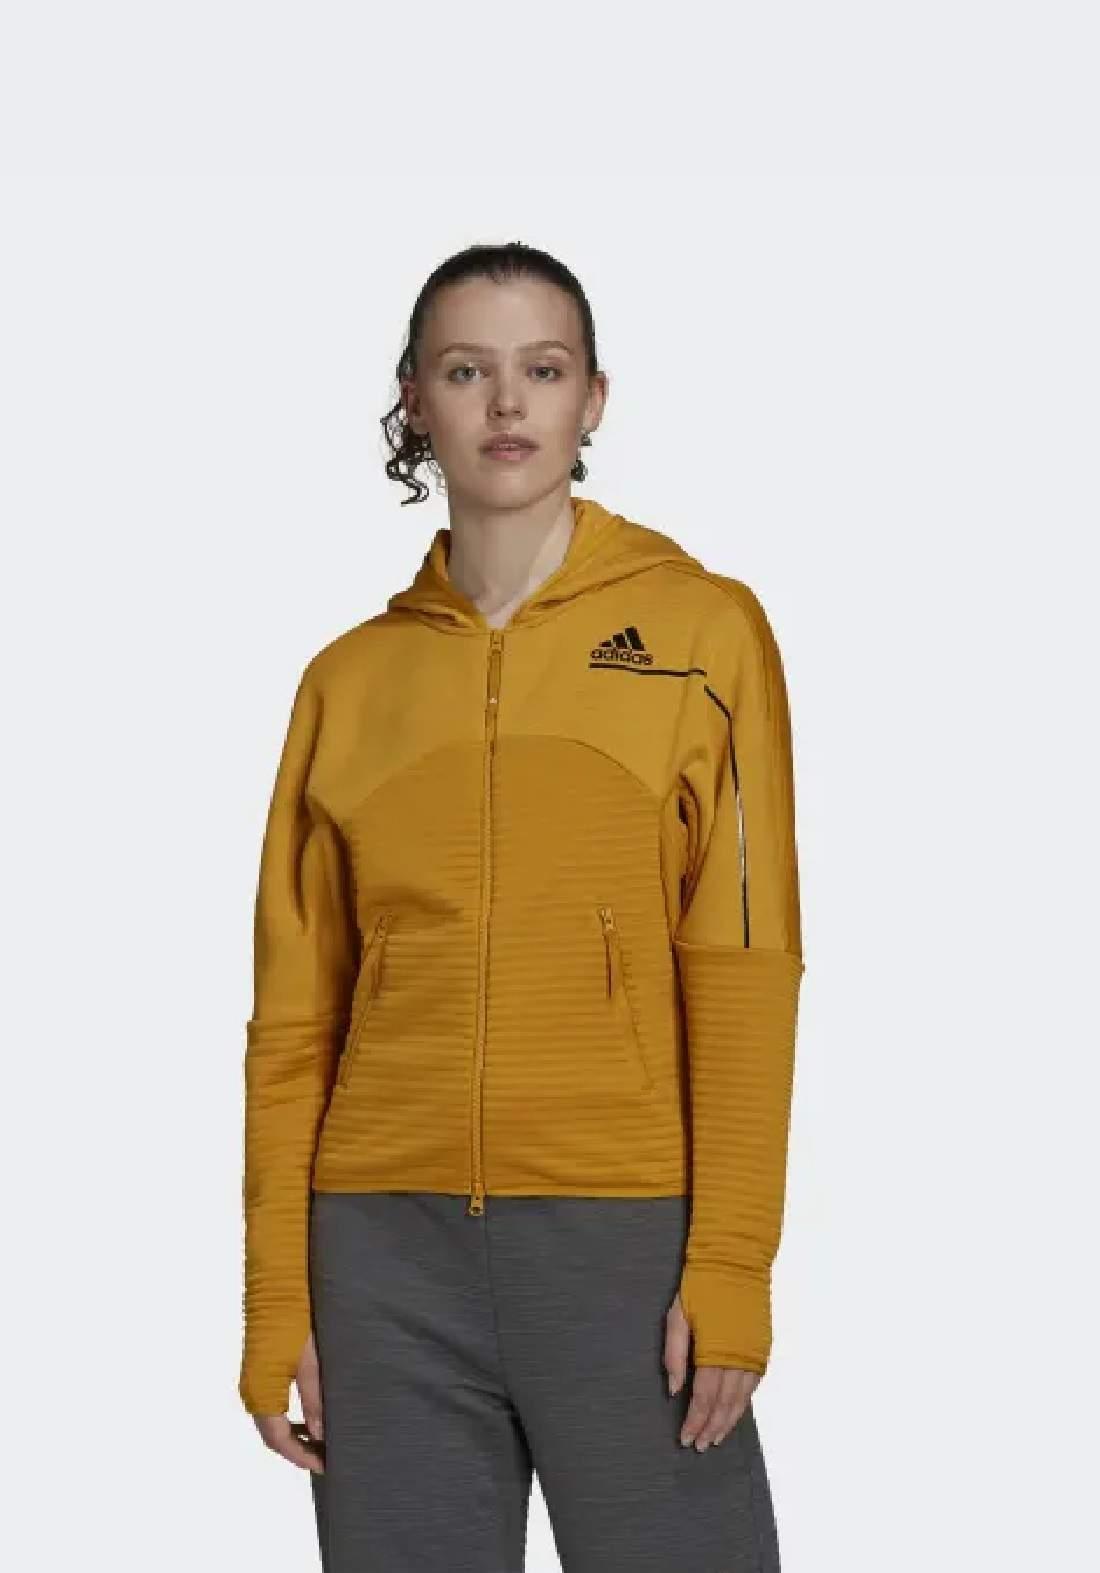 Adidas سويتر نسائي رياضي اصفر اللون من